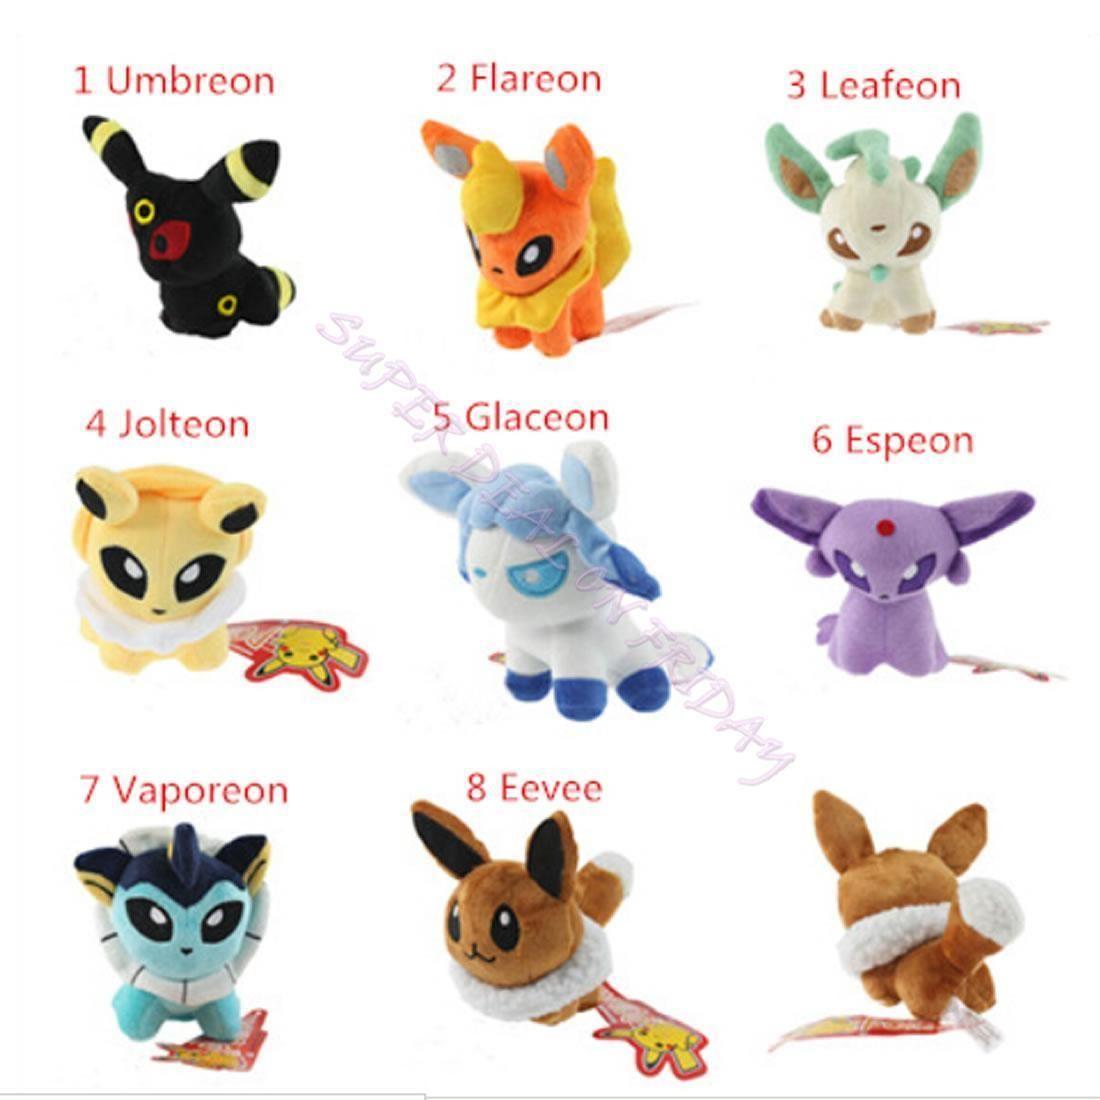 Pokemon Go Umbreon Eevee Jolteon Vaporeon Flareon Glaceon Leafeon ...